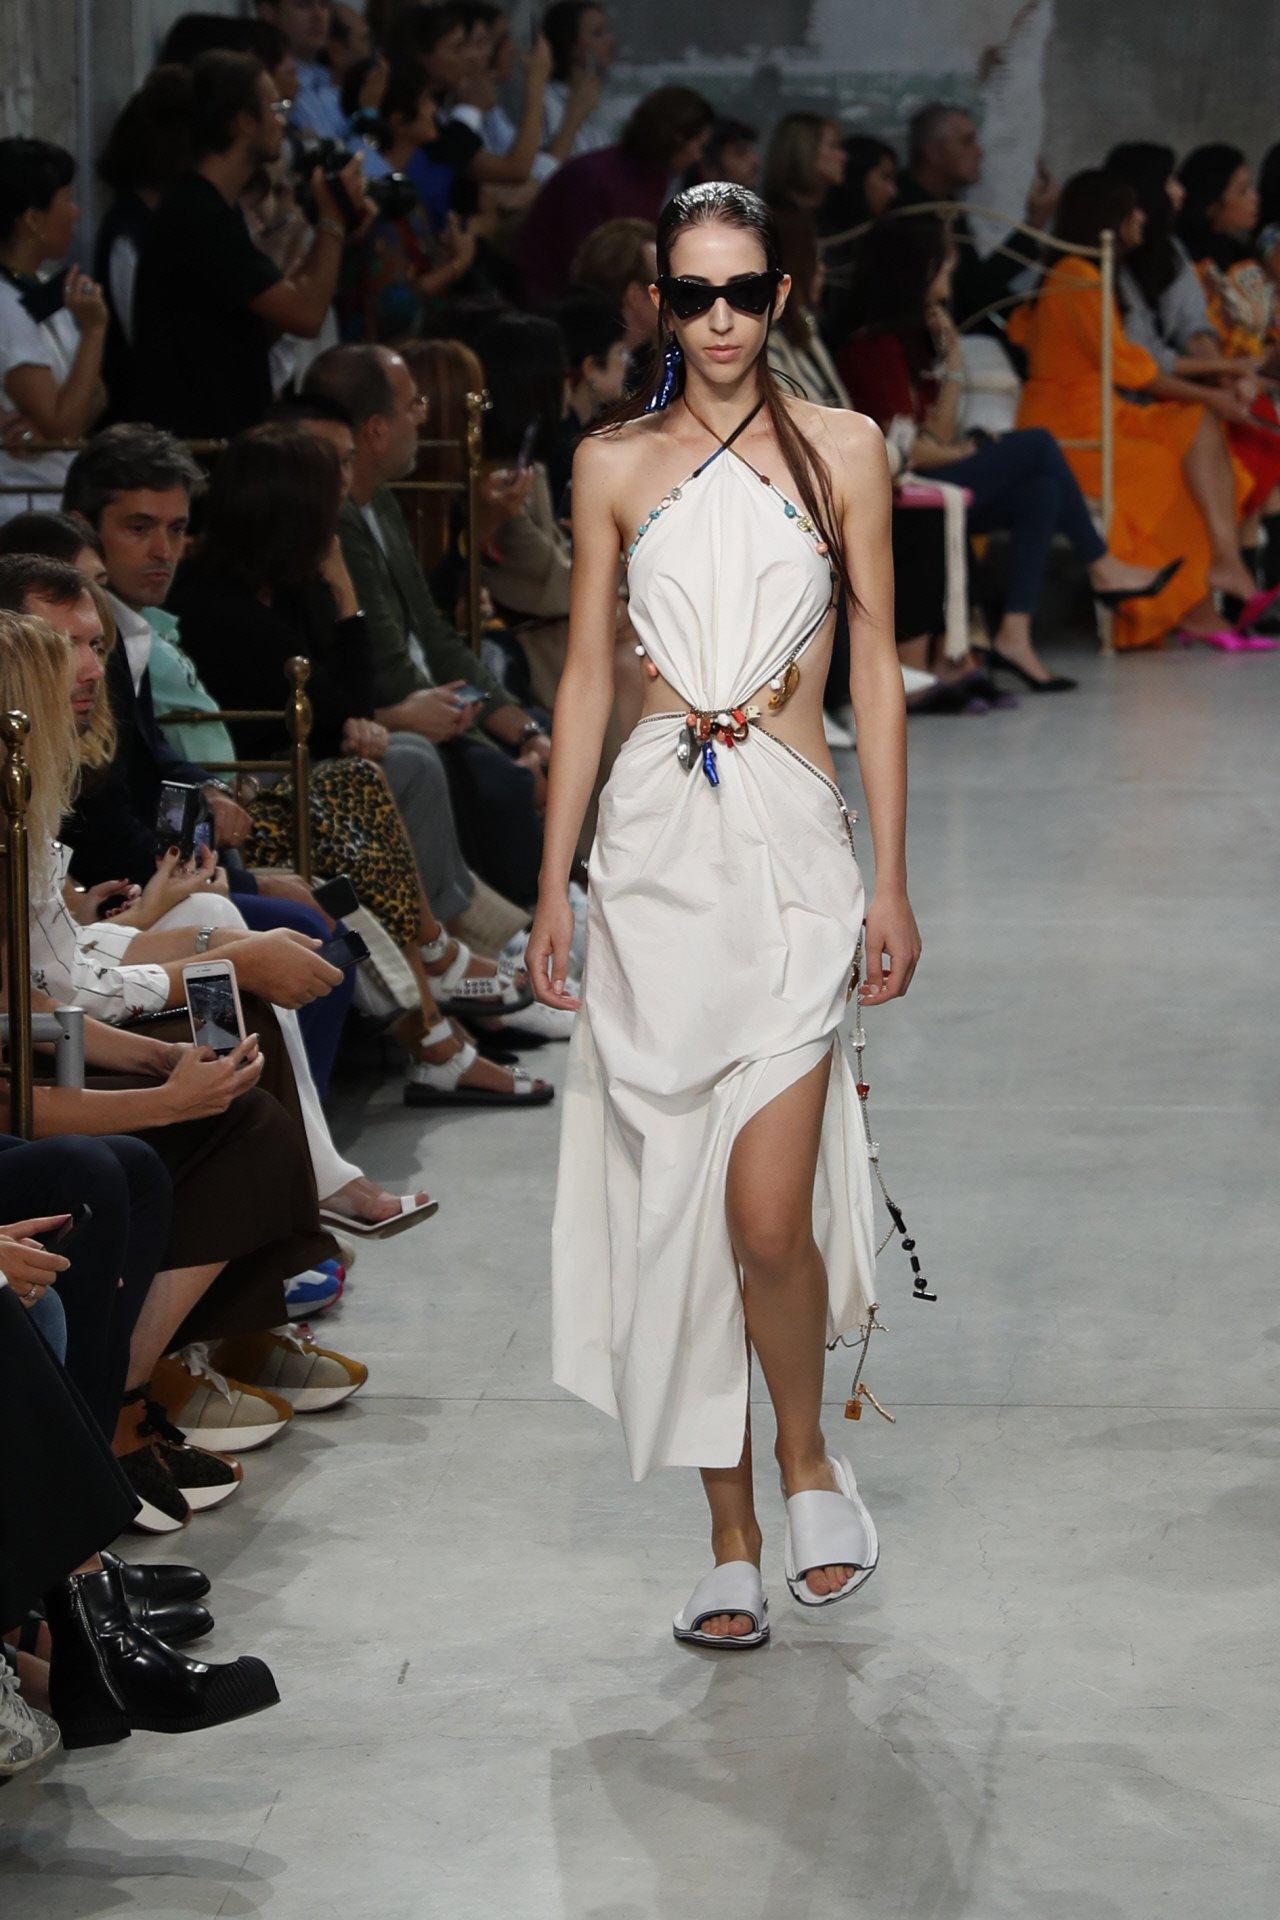 Moda Fashion Verano 2019 En Primavera Tendencias De Vistas Milan tsQrhd